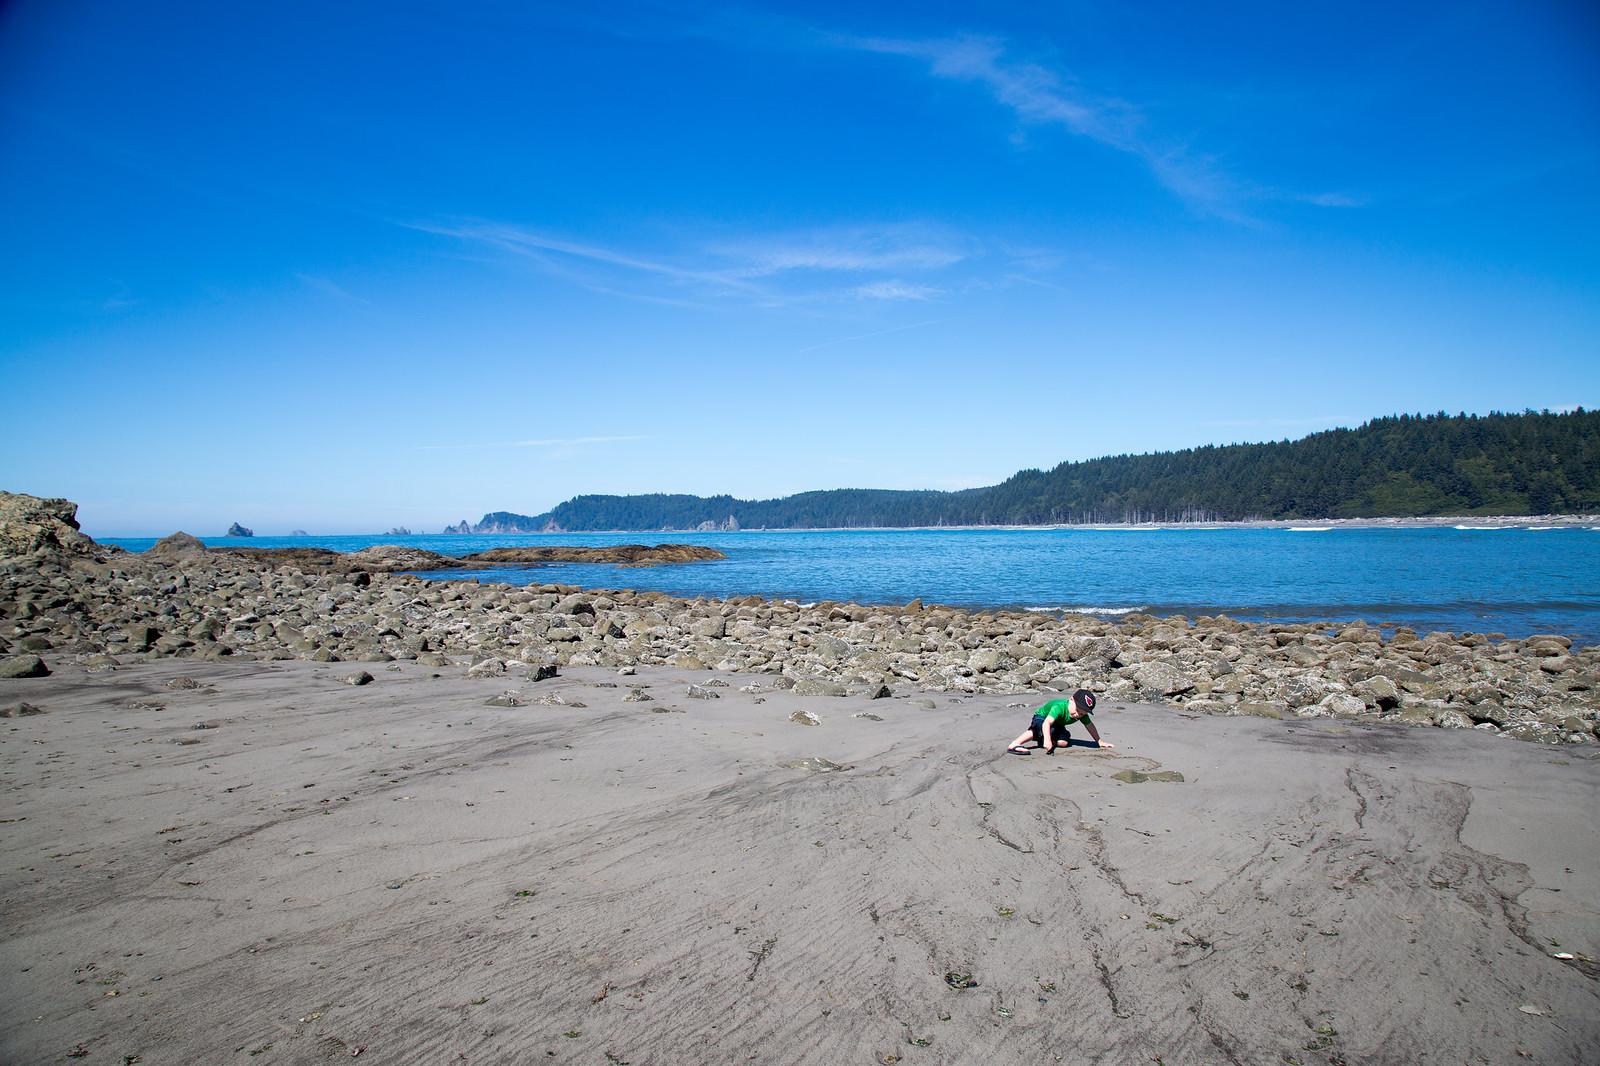 2015-08-24 Lake Sutherland-2747.jpg